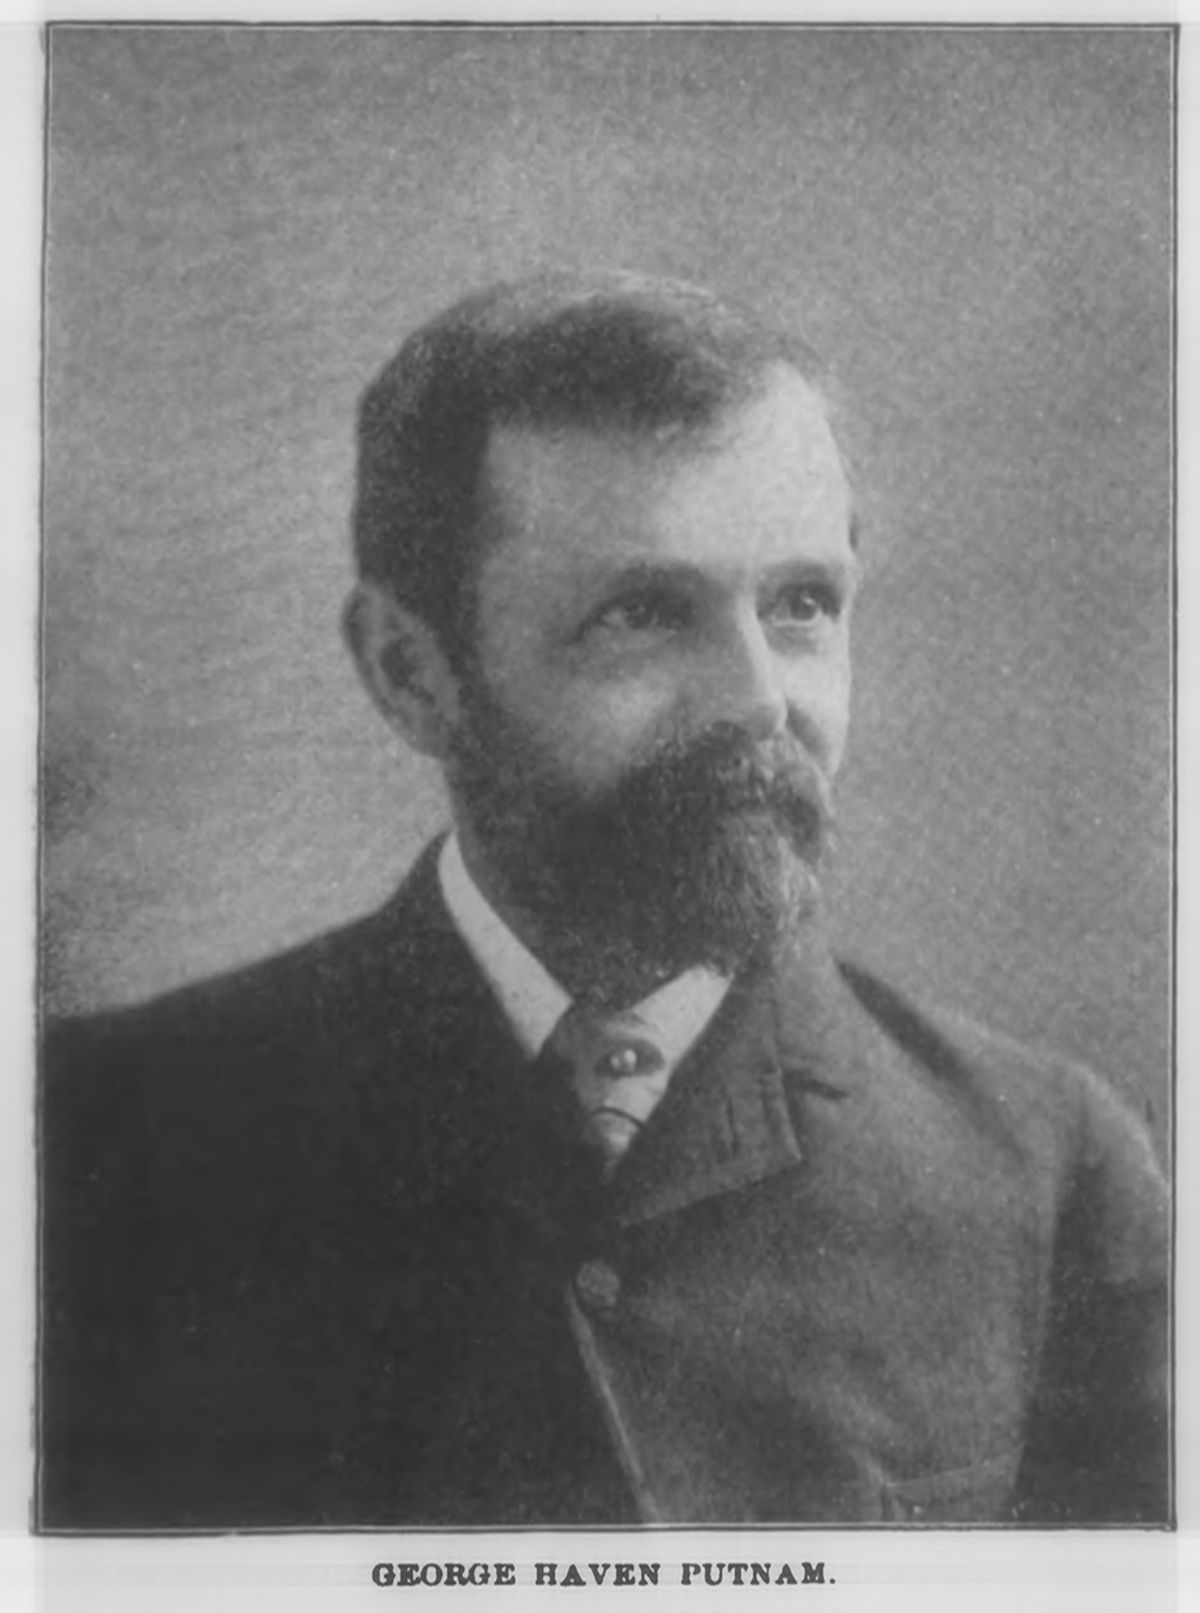 George Haven Putnam Wikipedia